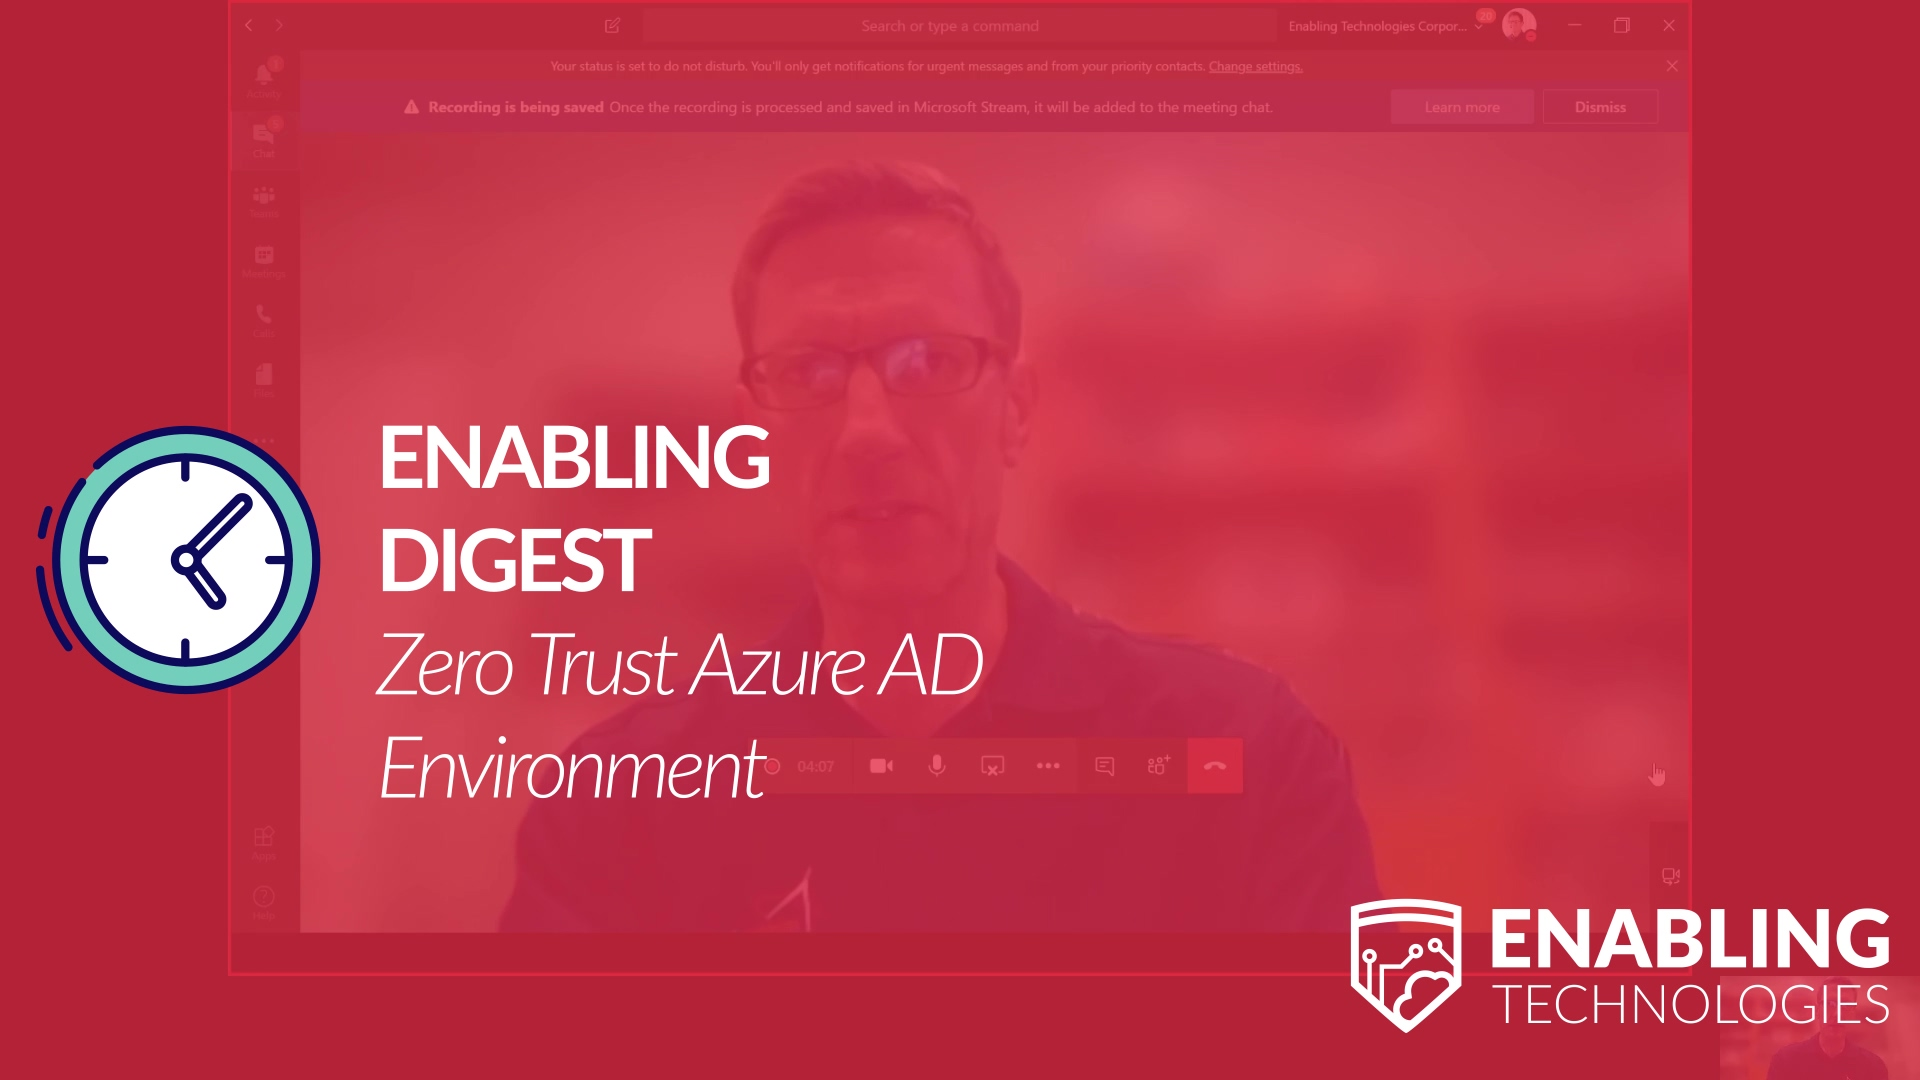 Enabling Digest - Zero Trust Azure AD